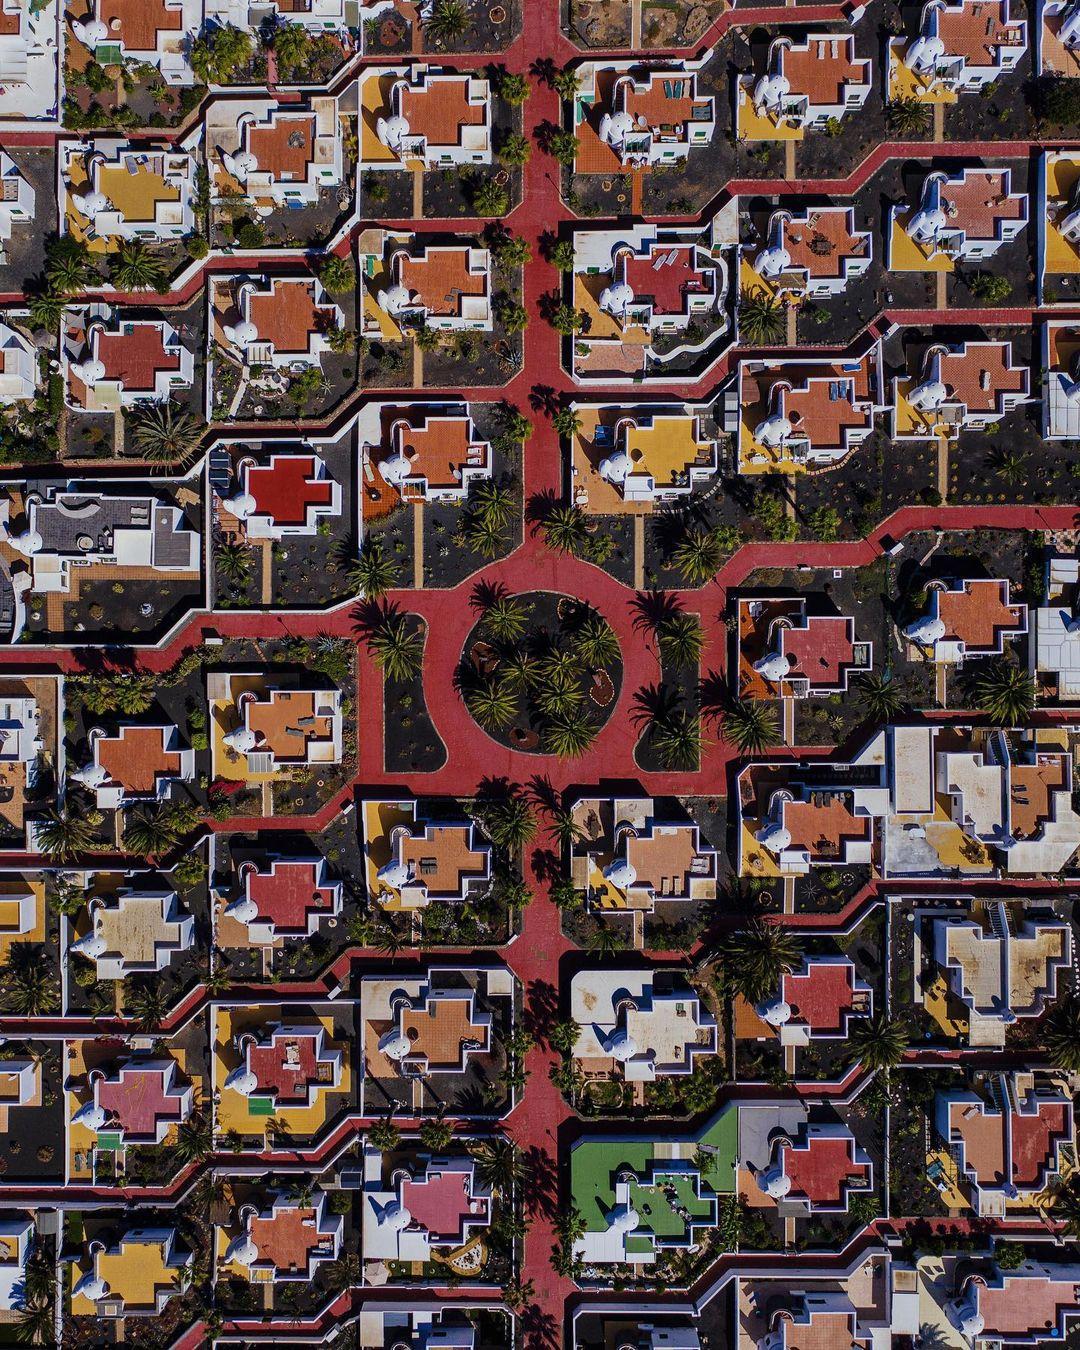 Впечатляющие аэрофотоснимки от Уилла Чейни